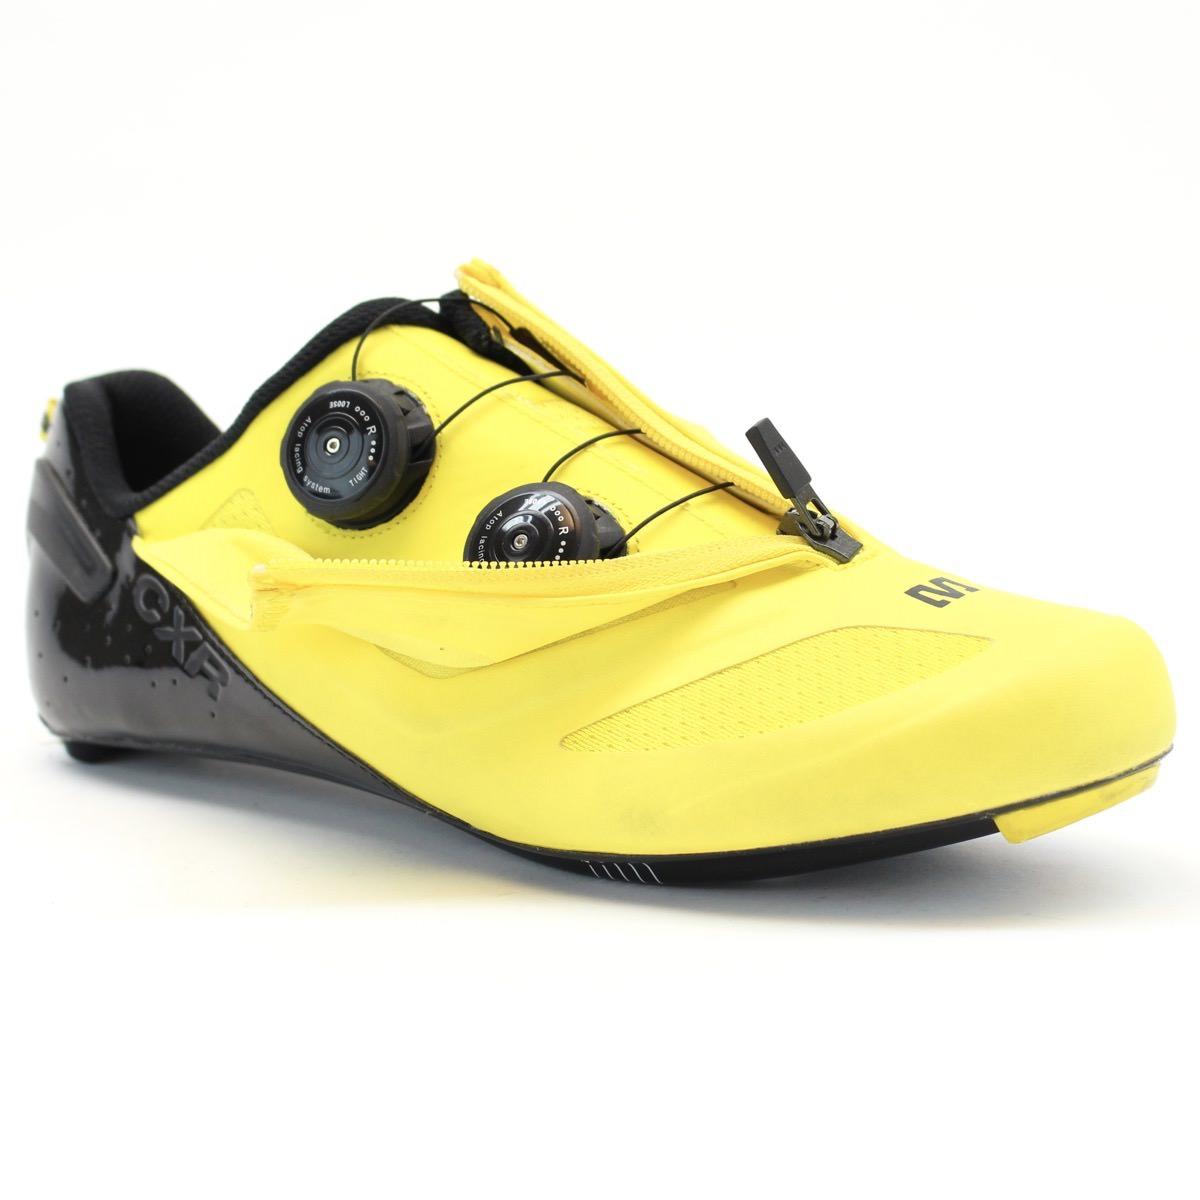 Mavic Aero Shoe Cover White